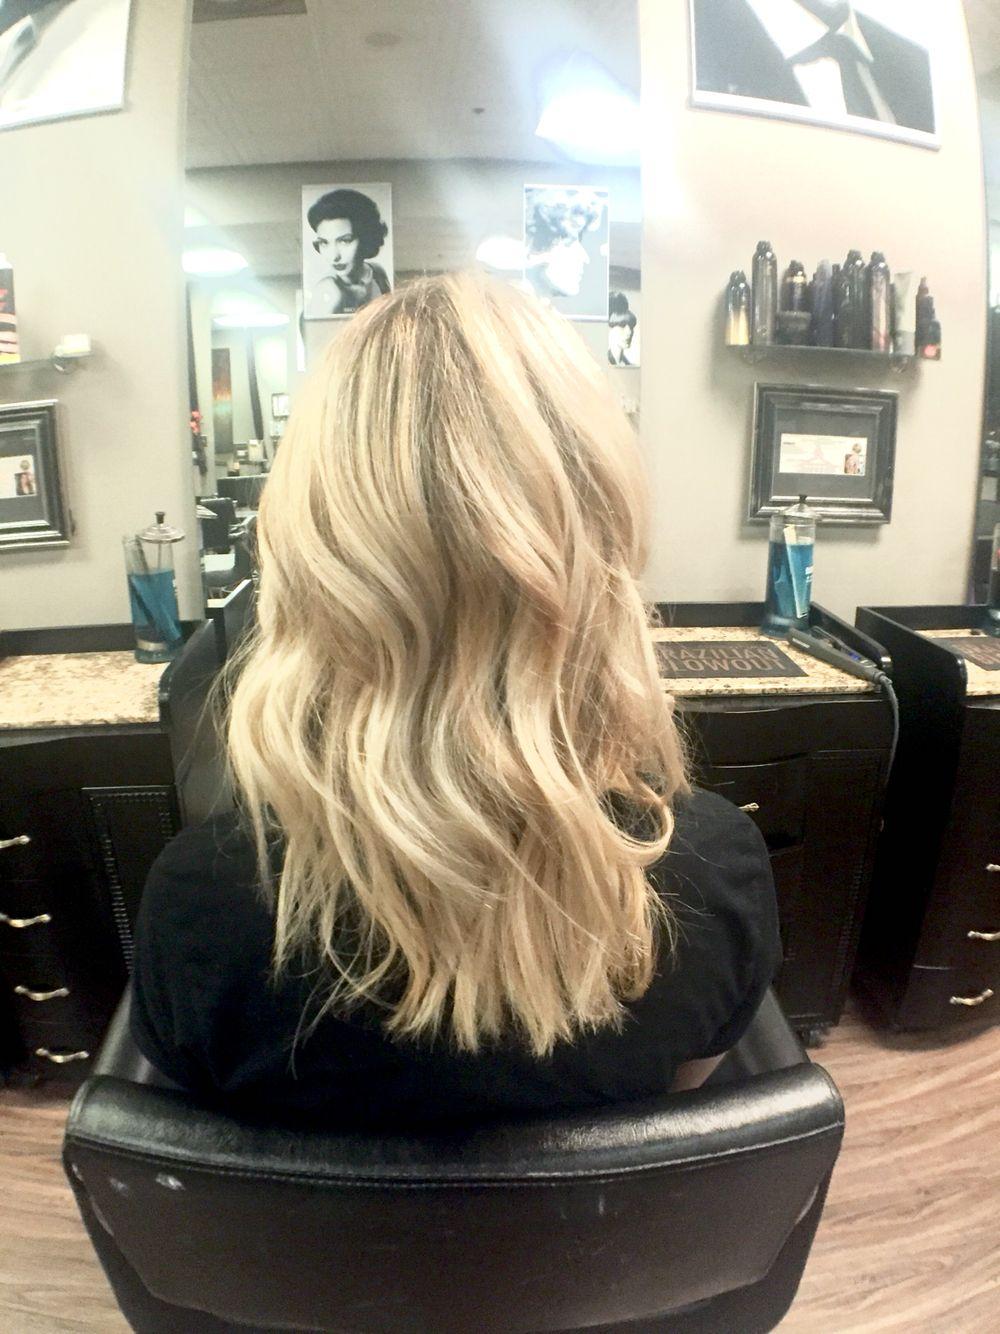 Blonde hair created by megan jones at idéologie salon in ormond